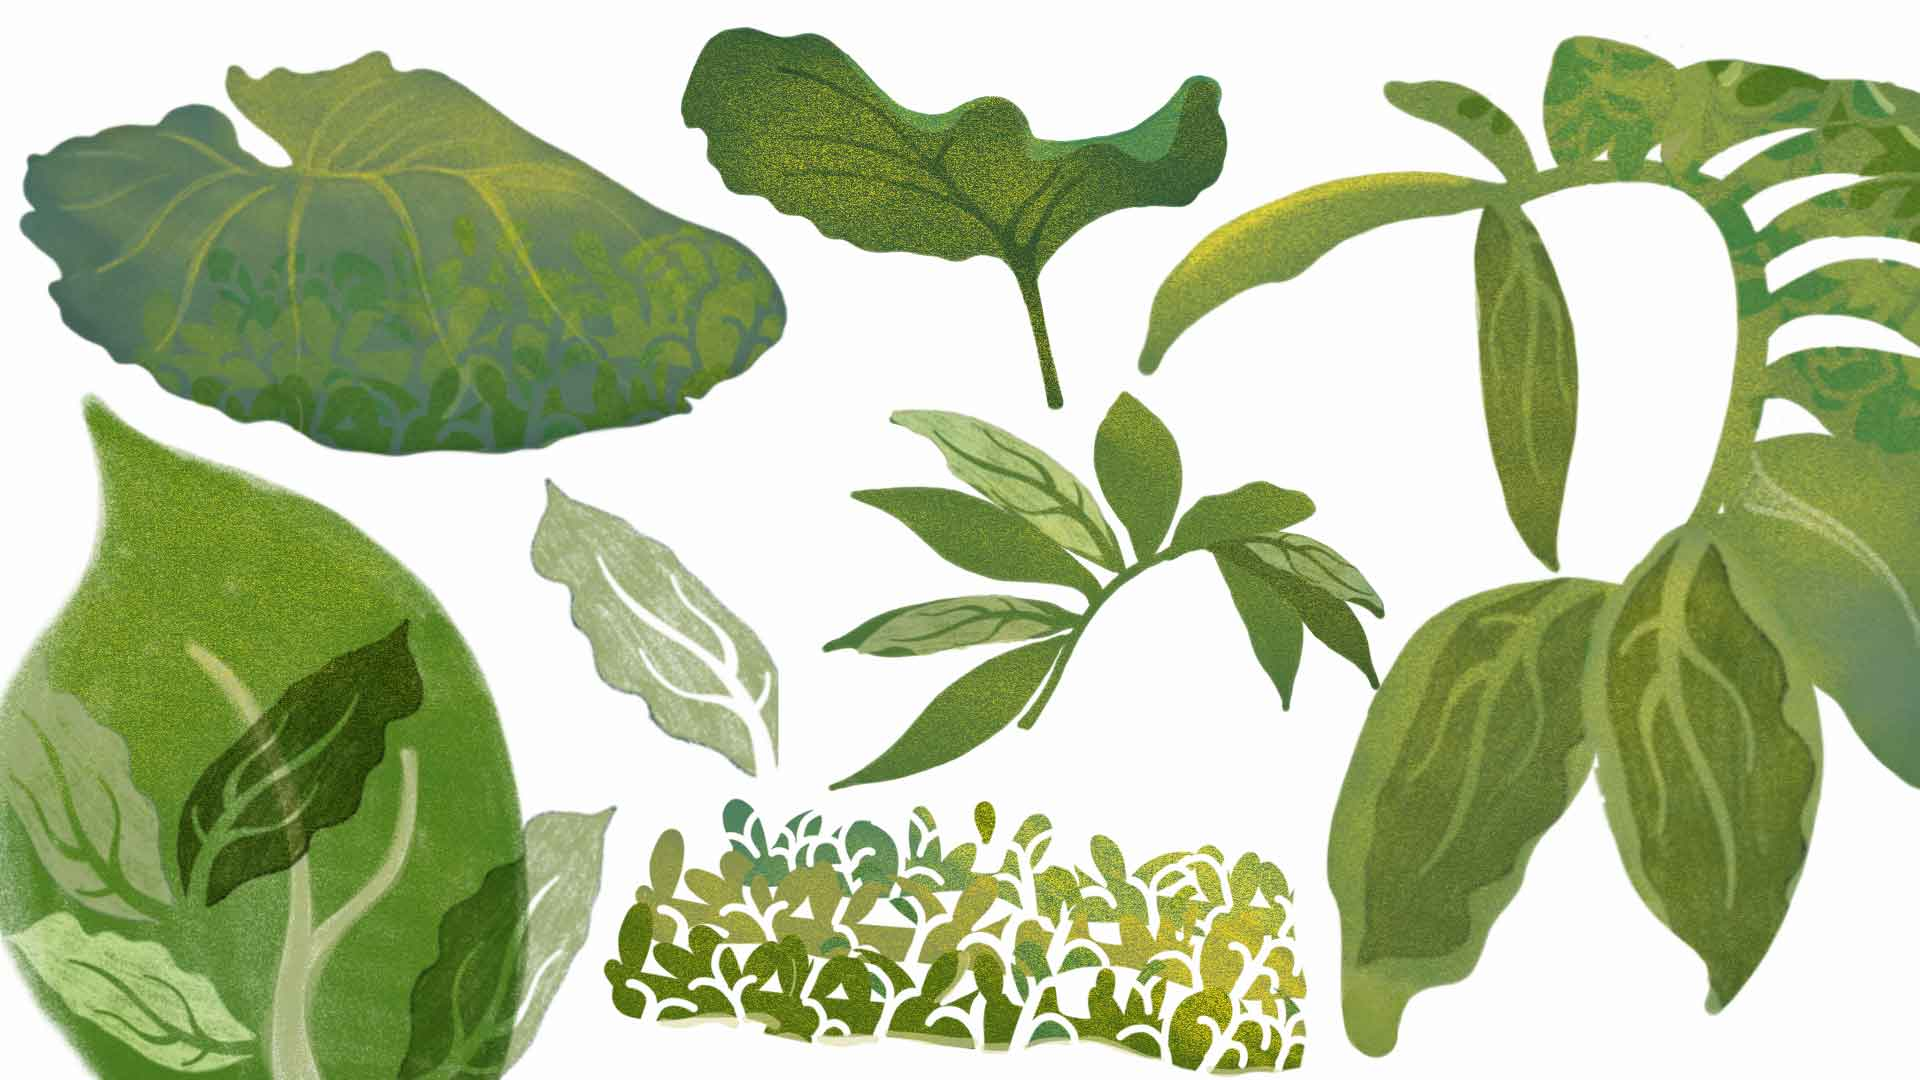 Green plant study